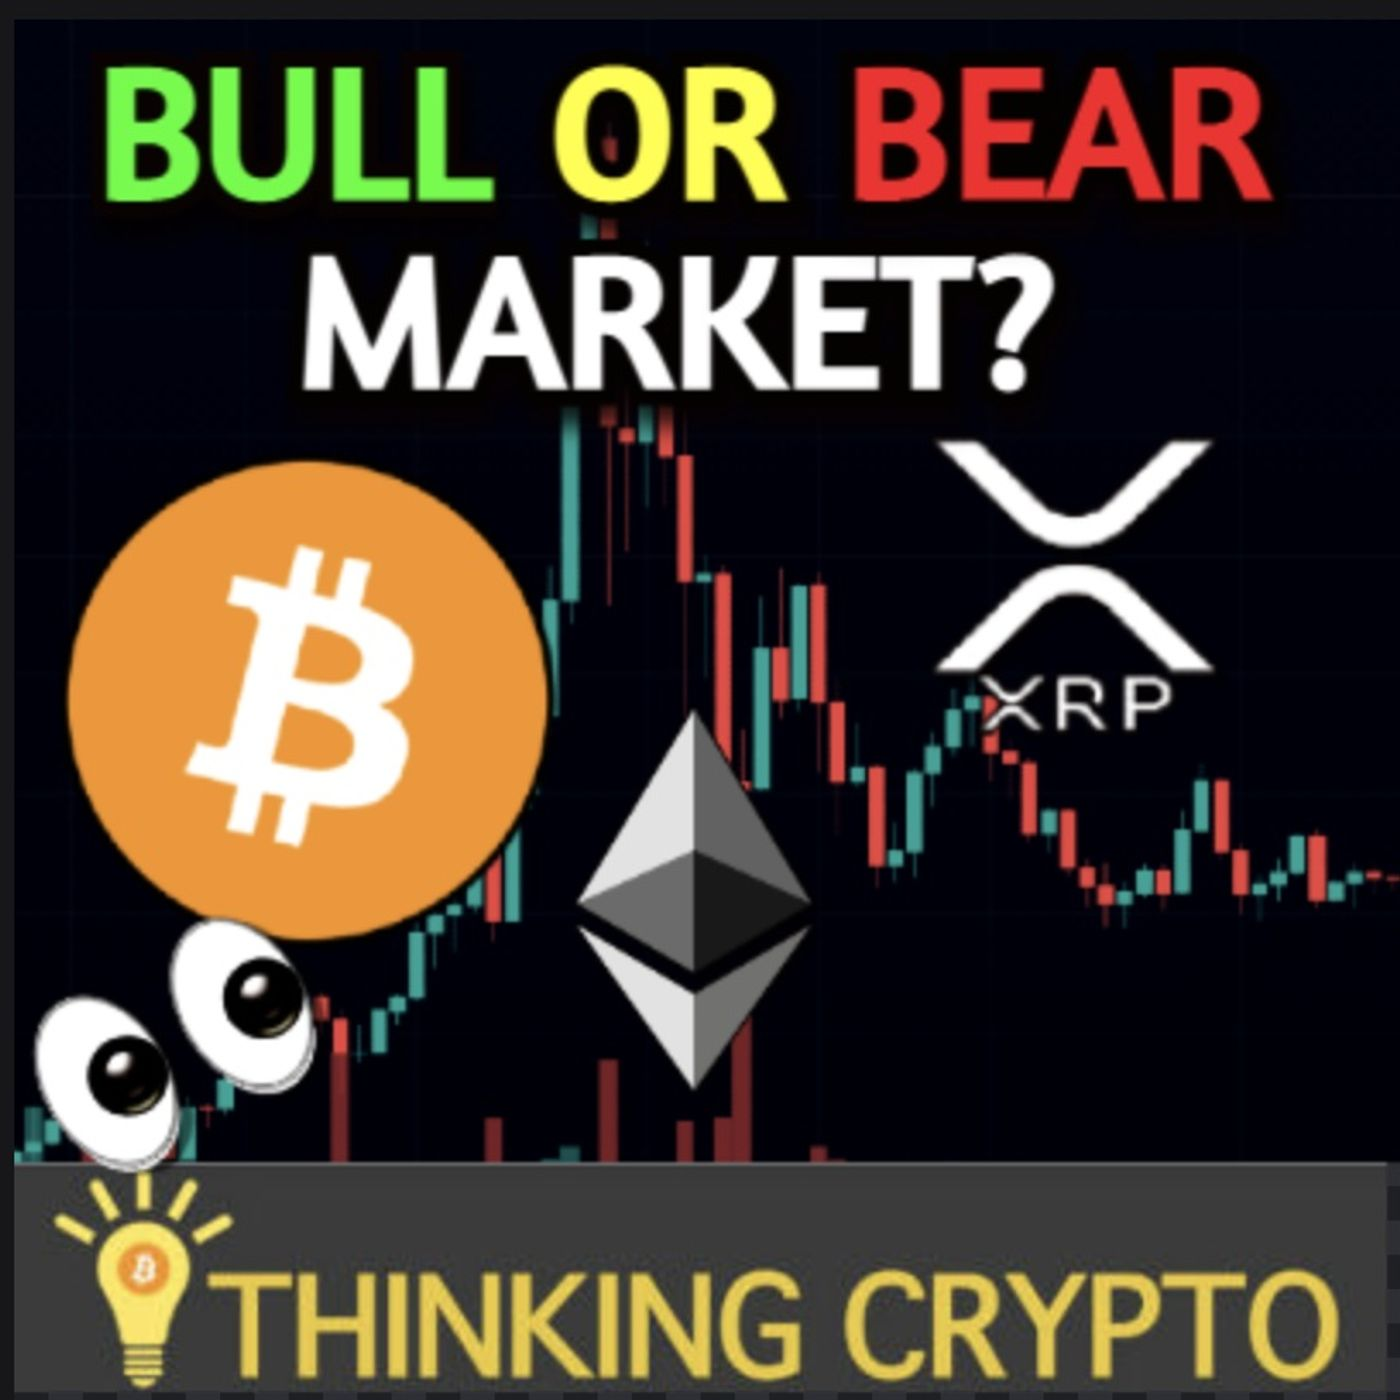 Crypto Bull or Bear Market? Bitcoin Will Kill Us All - Billionaires Are Bullish - President Biden Crypto Regulations